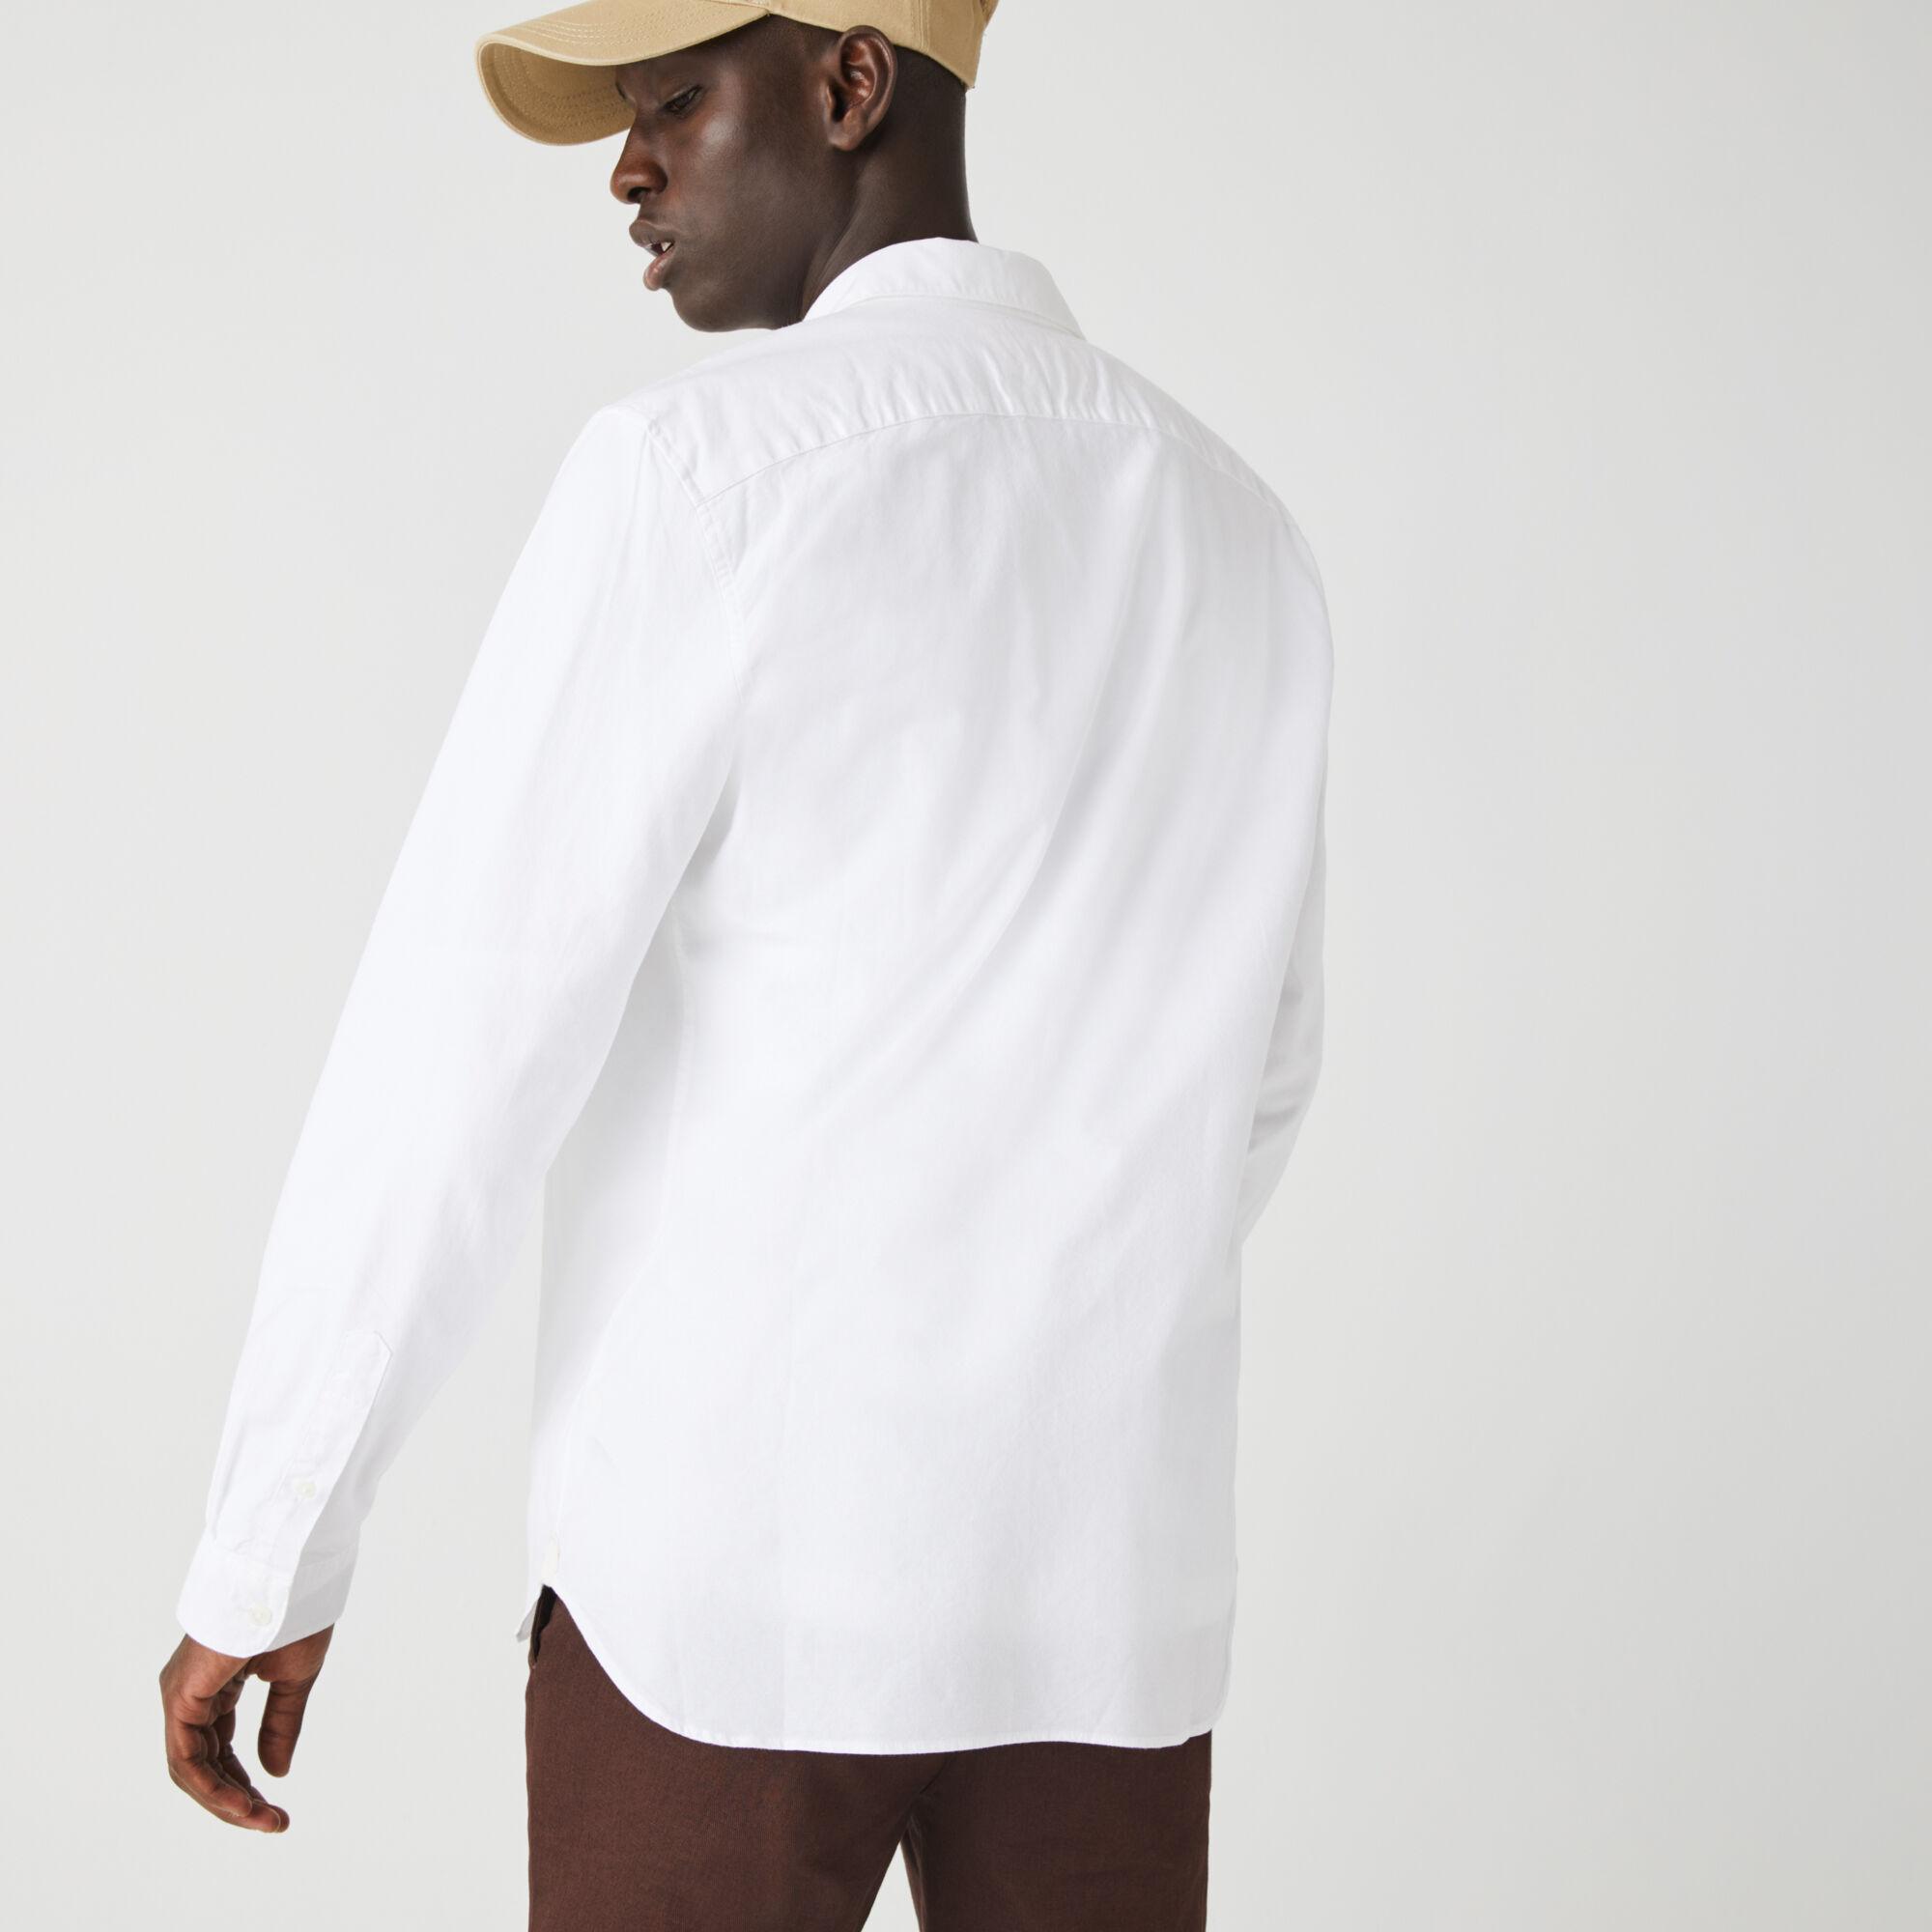 Men's Slim Fit Stretch Oxford Cotton Shirt